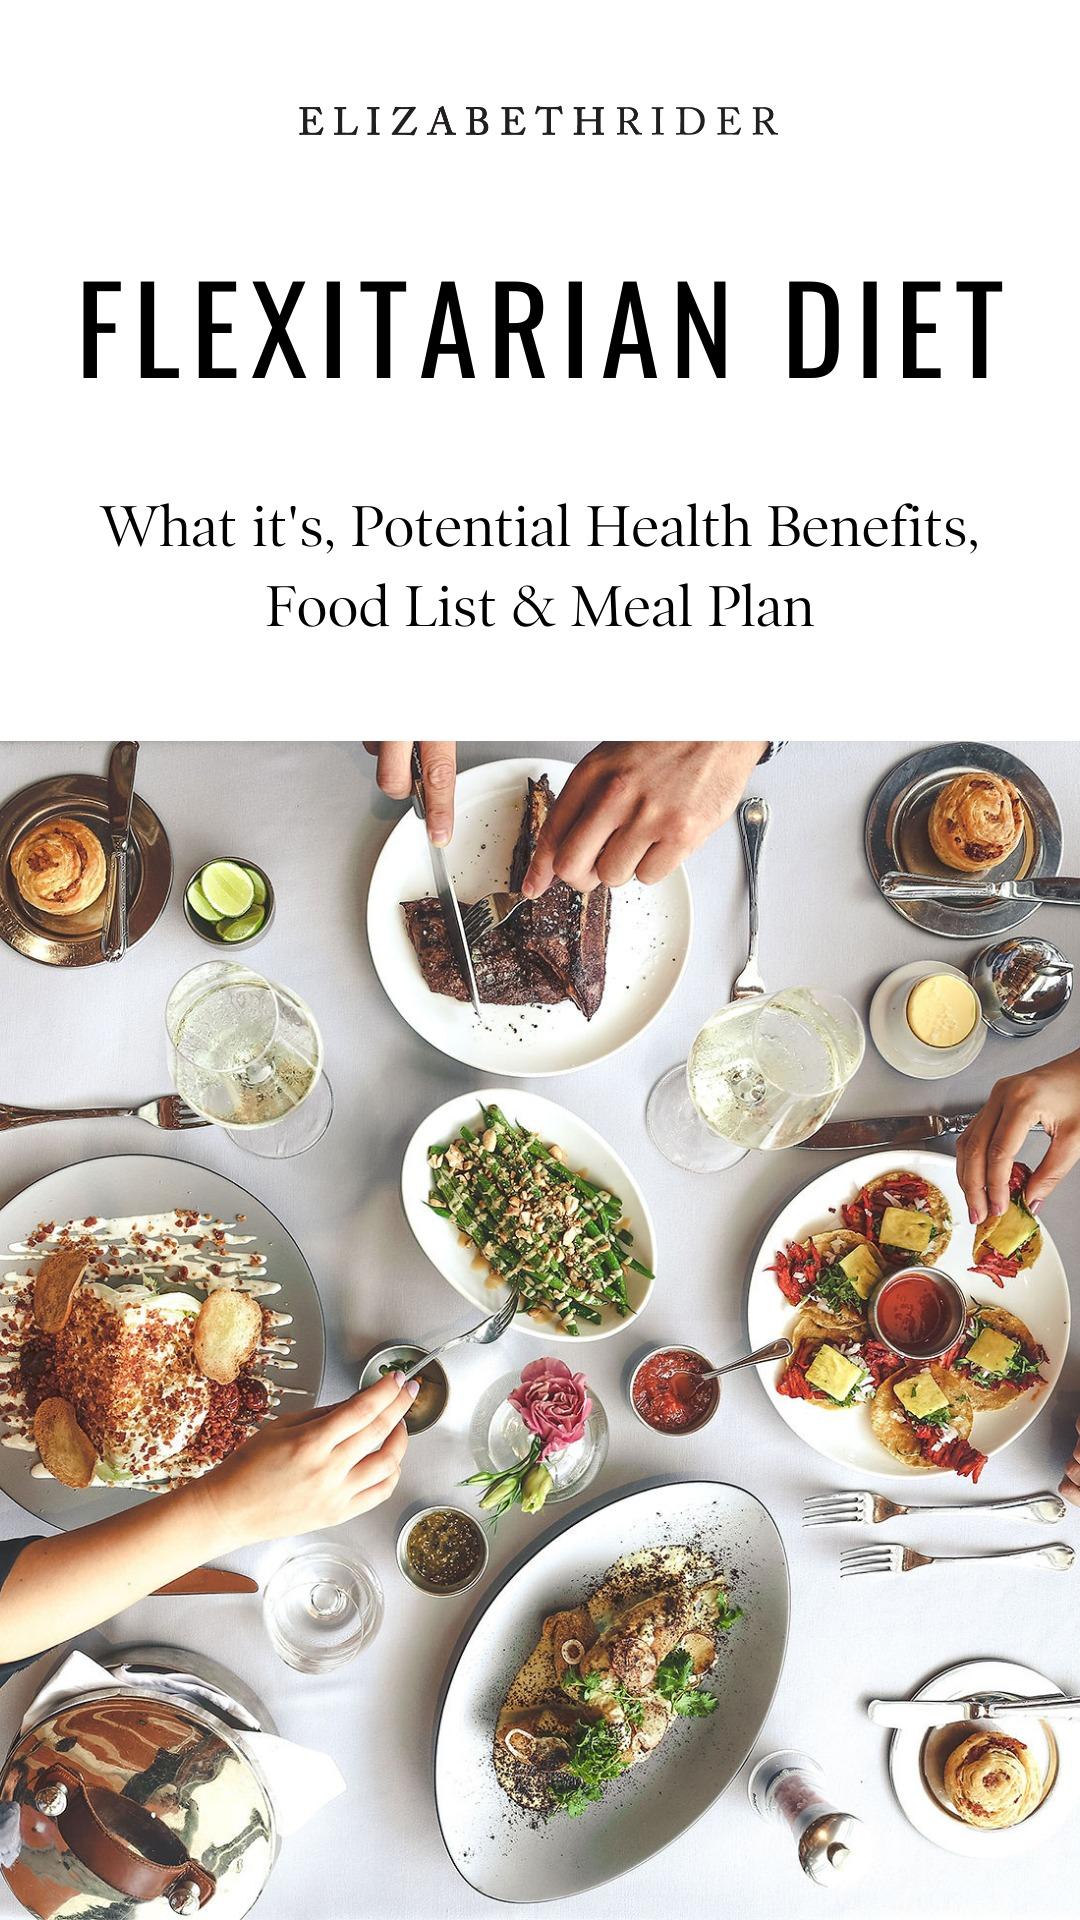 Flexitarian Diet Guide: Benefits, Food List & Meal Plan | Elizabeth Rider